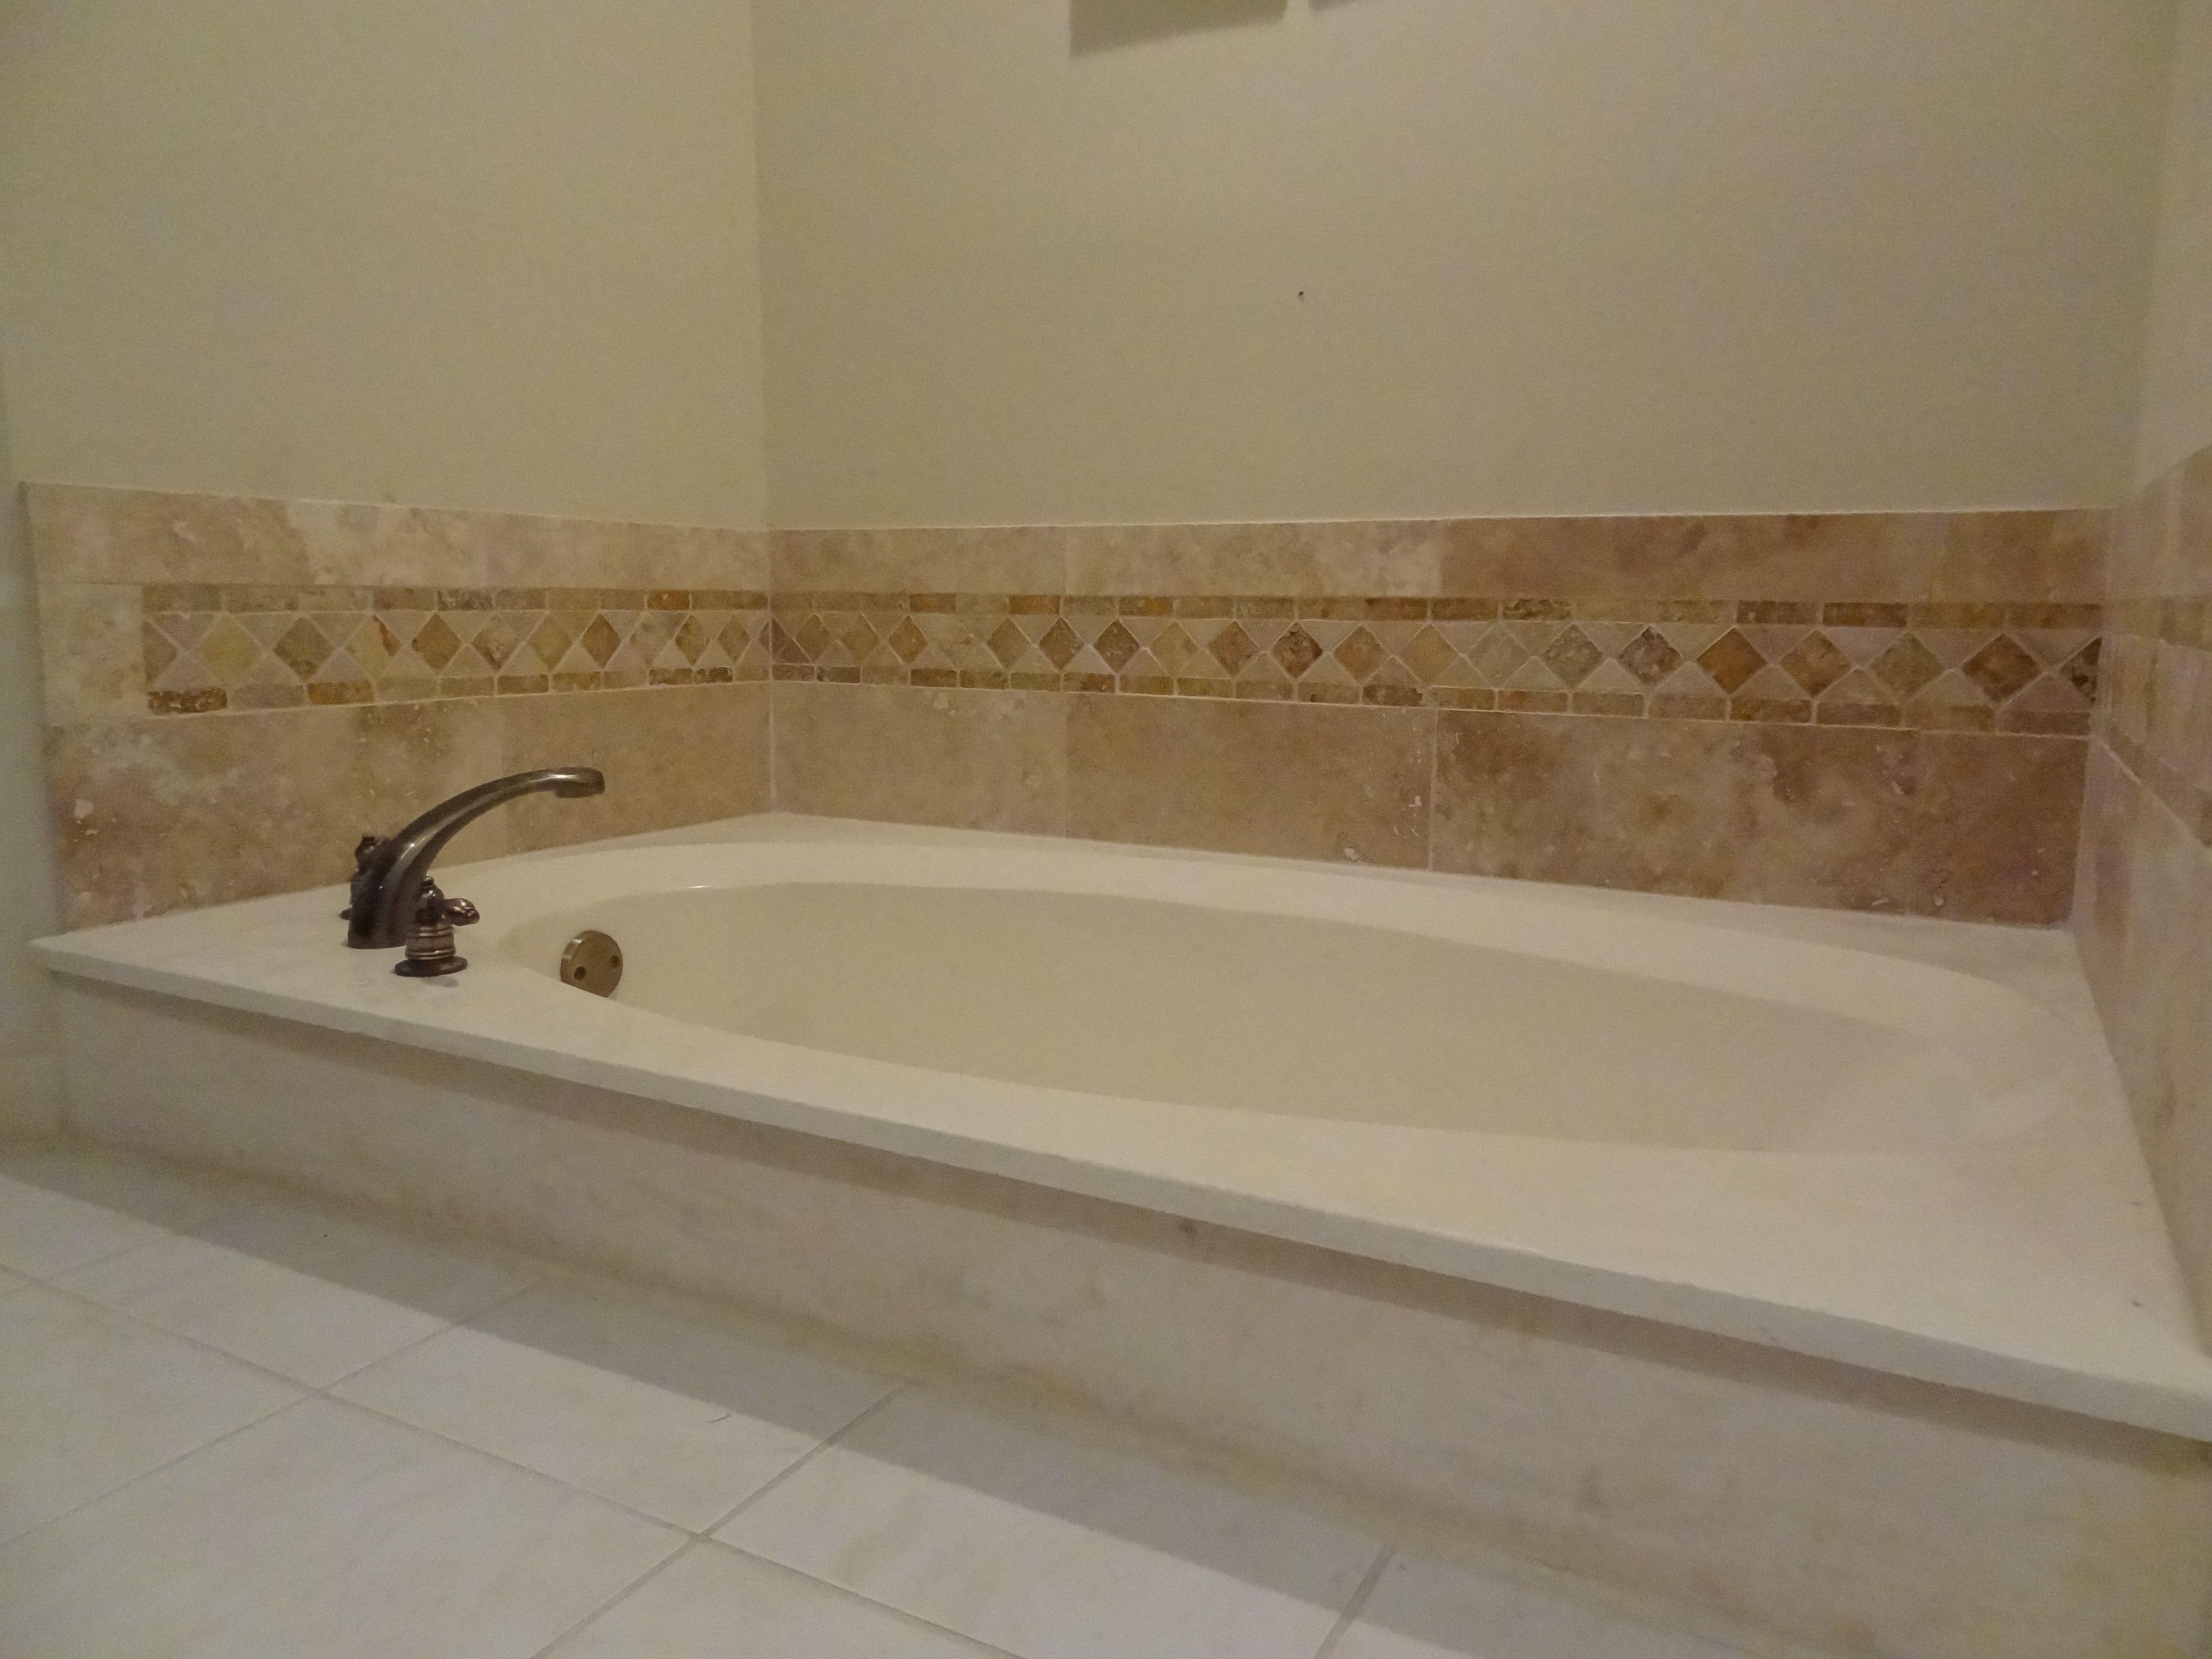 Our Own Finished Bathtub Backsplash Of Travertine Tile Bathroom